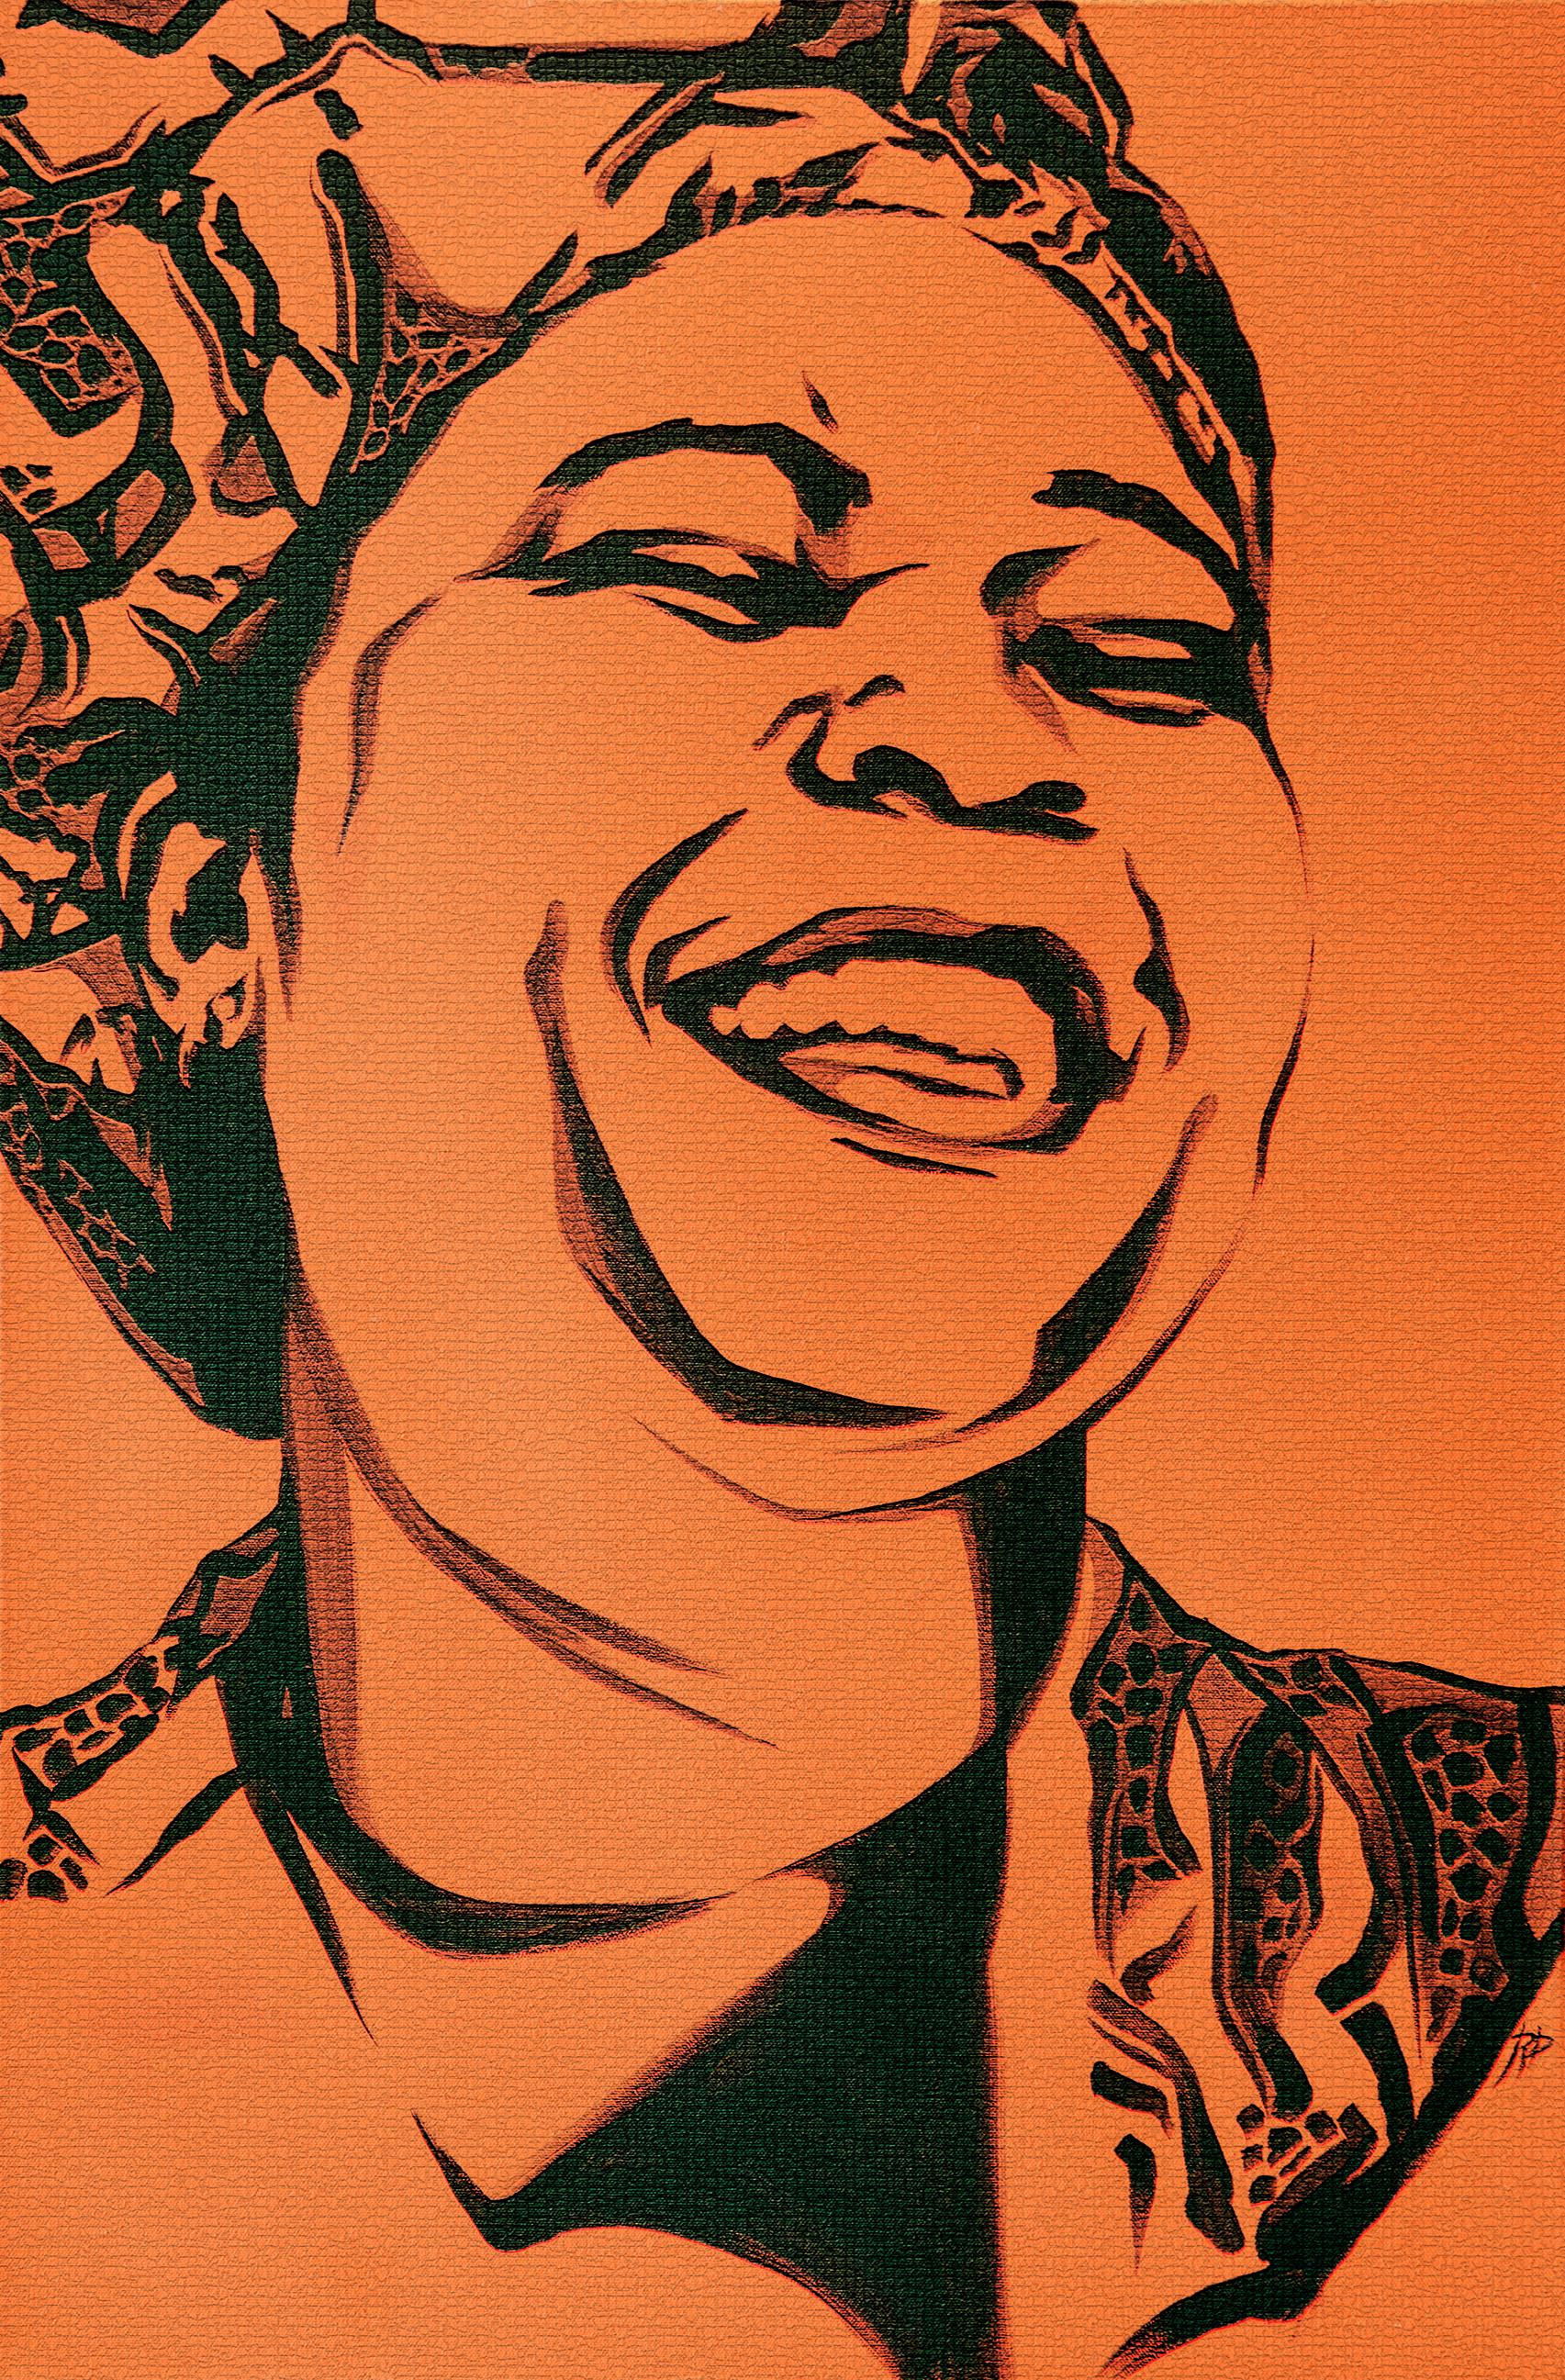 Leymah Gbowee: Signed Prints